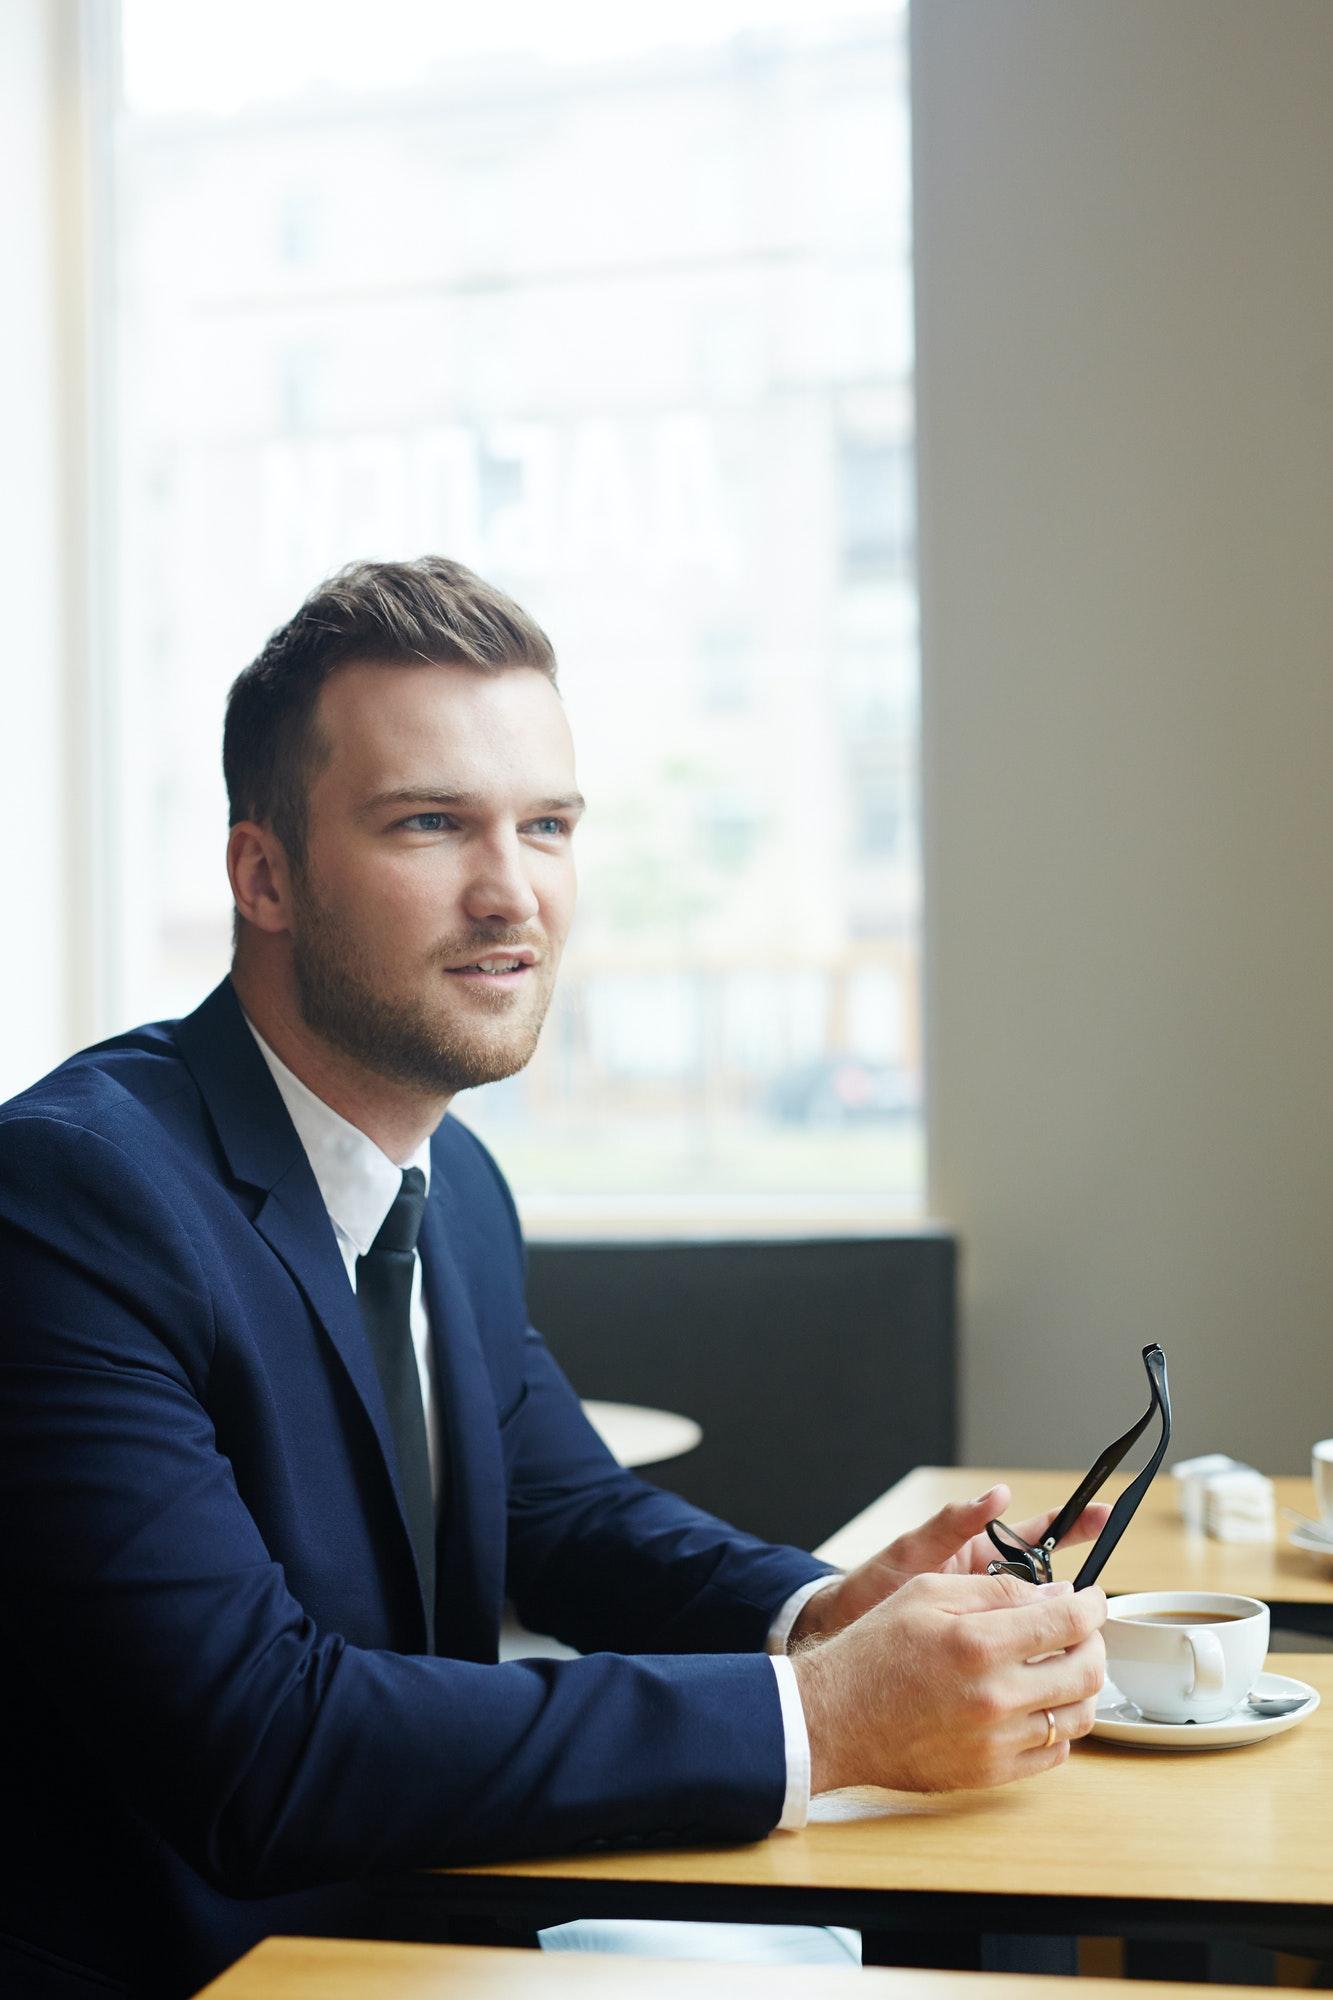 Køb ny hjemmeside advokat & jurist inkl. SEO